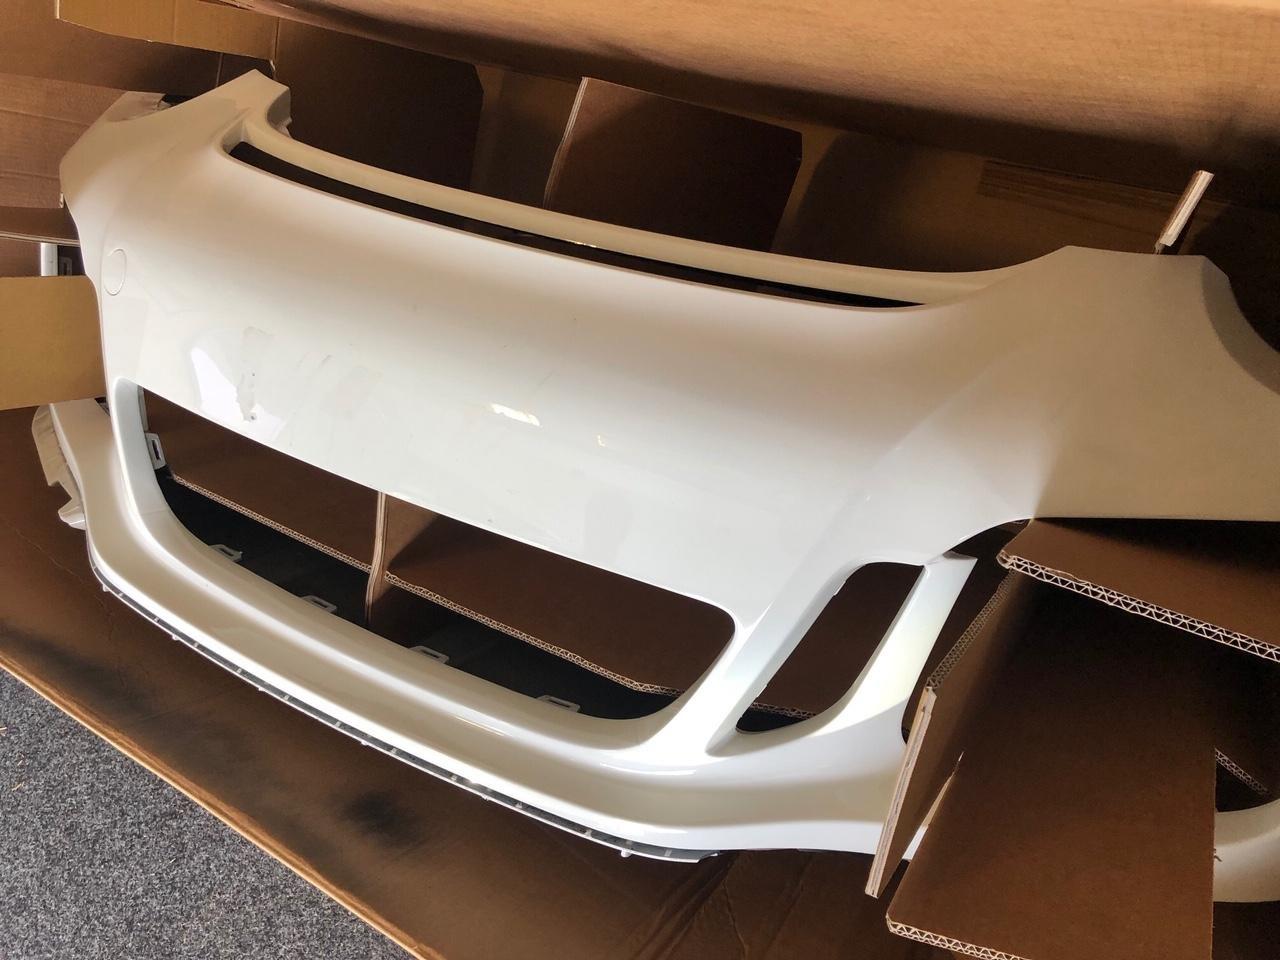 2015 Porsche 991 GT3 RS Gen 1 Front Bumper Cover For Sale (picture 3 of 4)